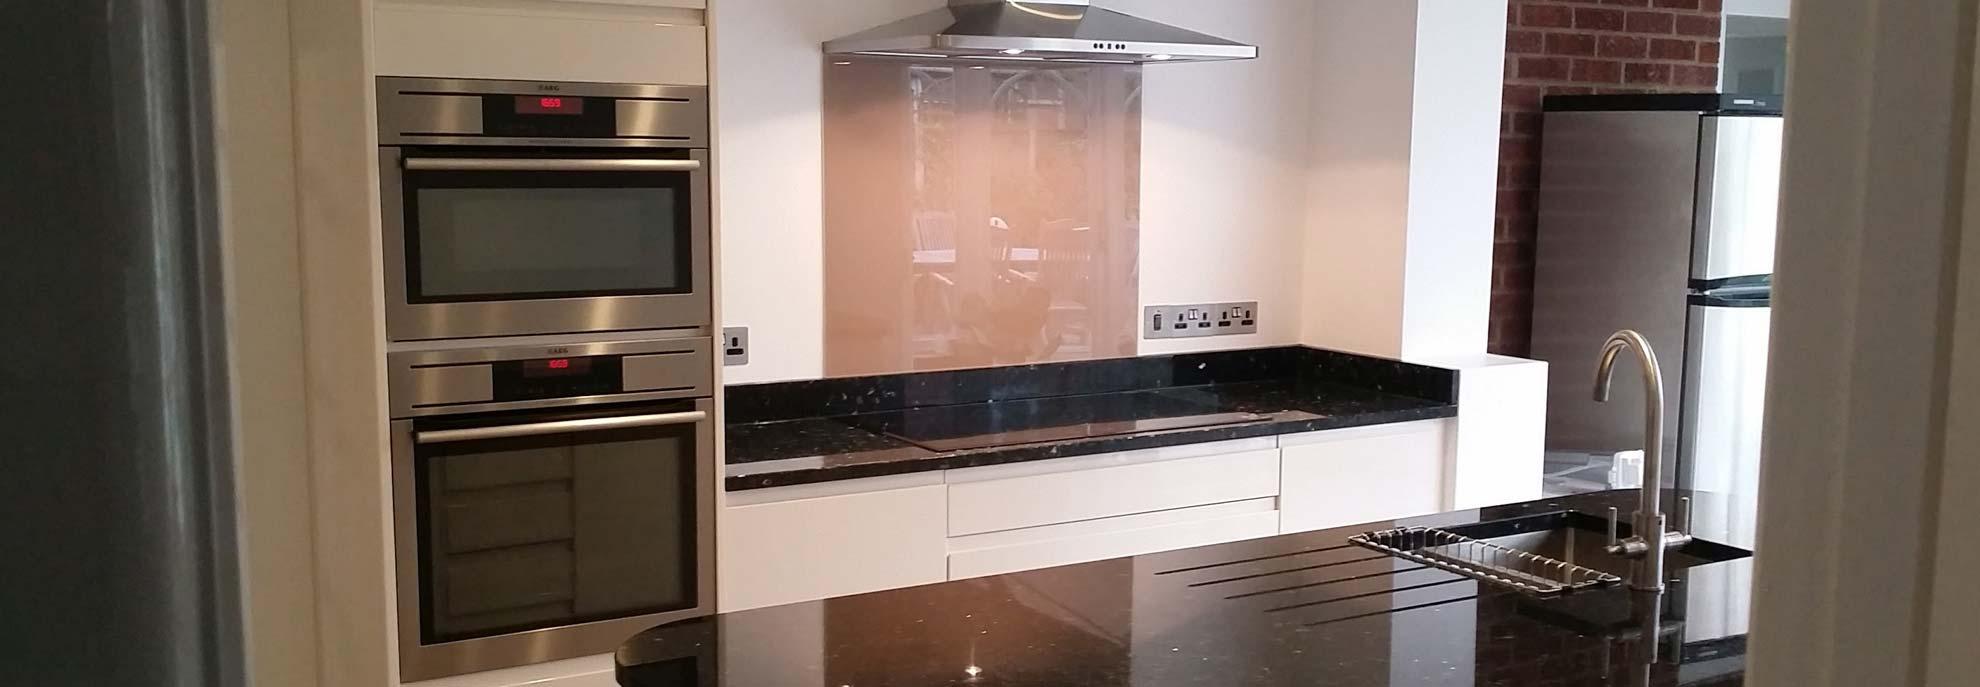 Kitchen fitting in Cromer